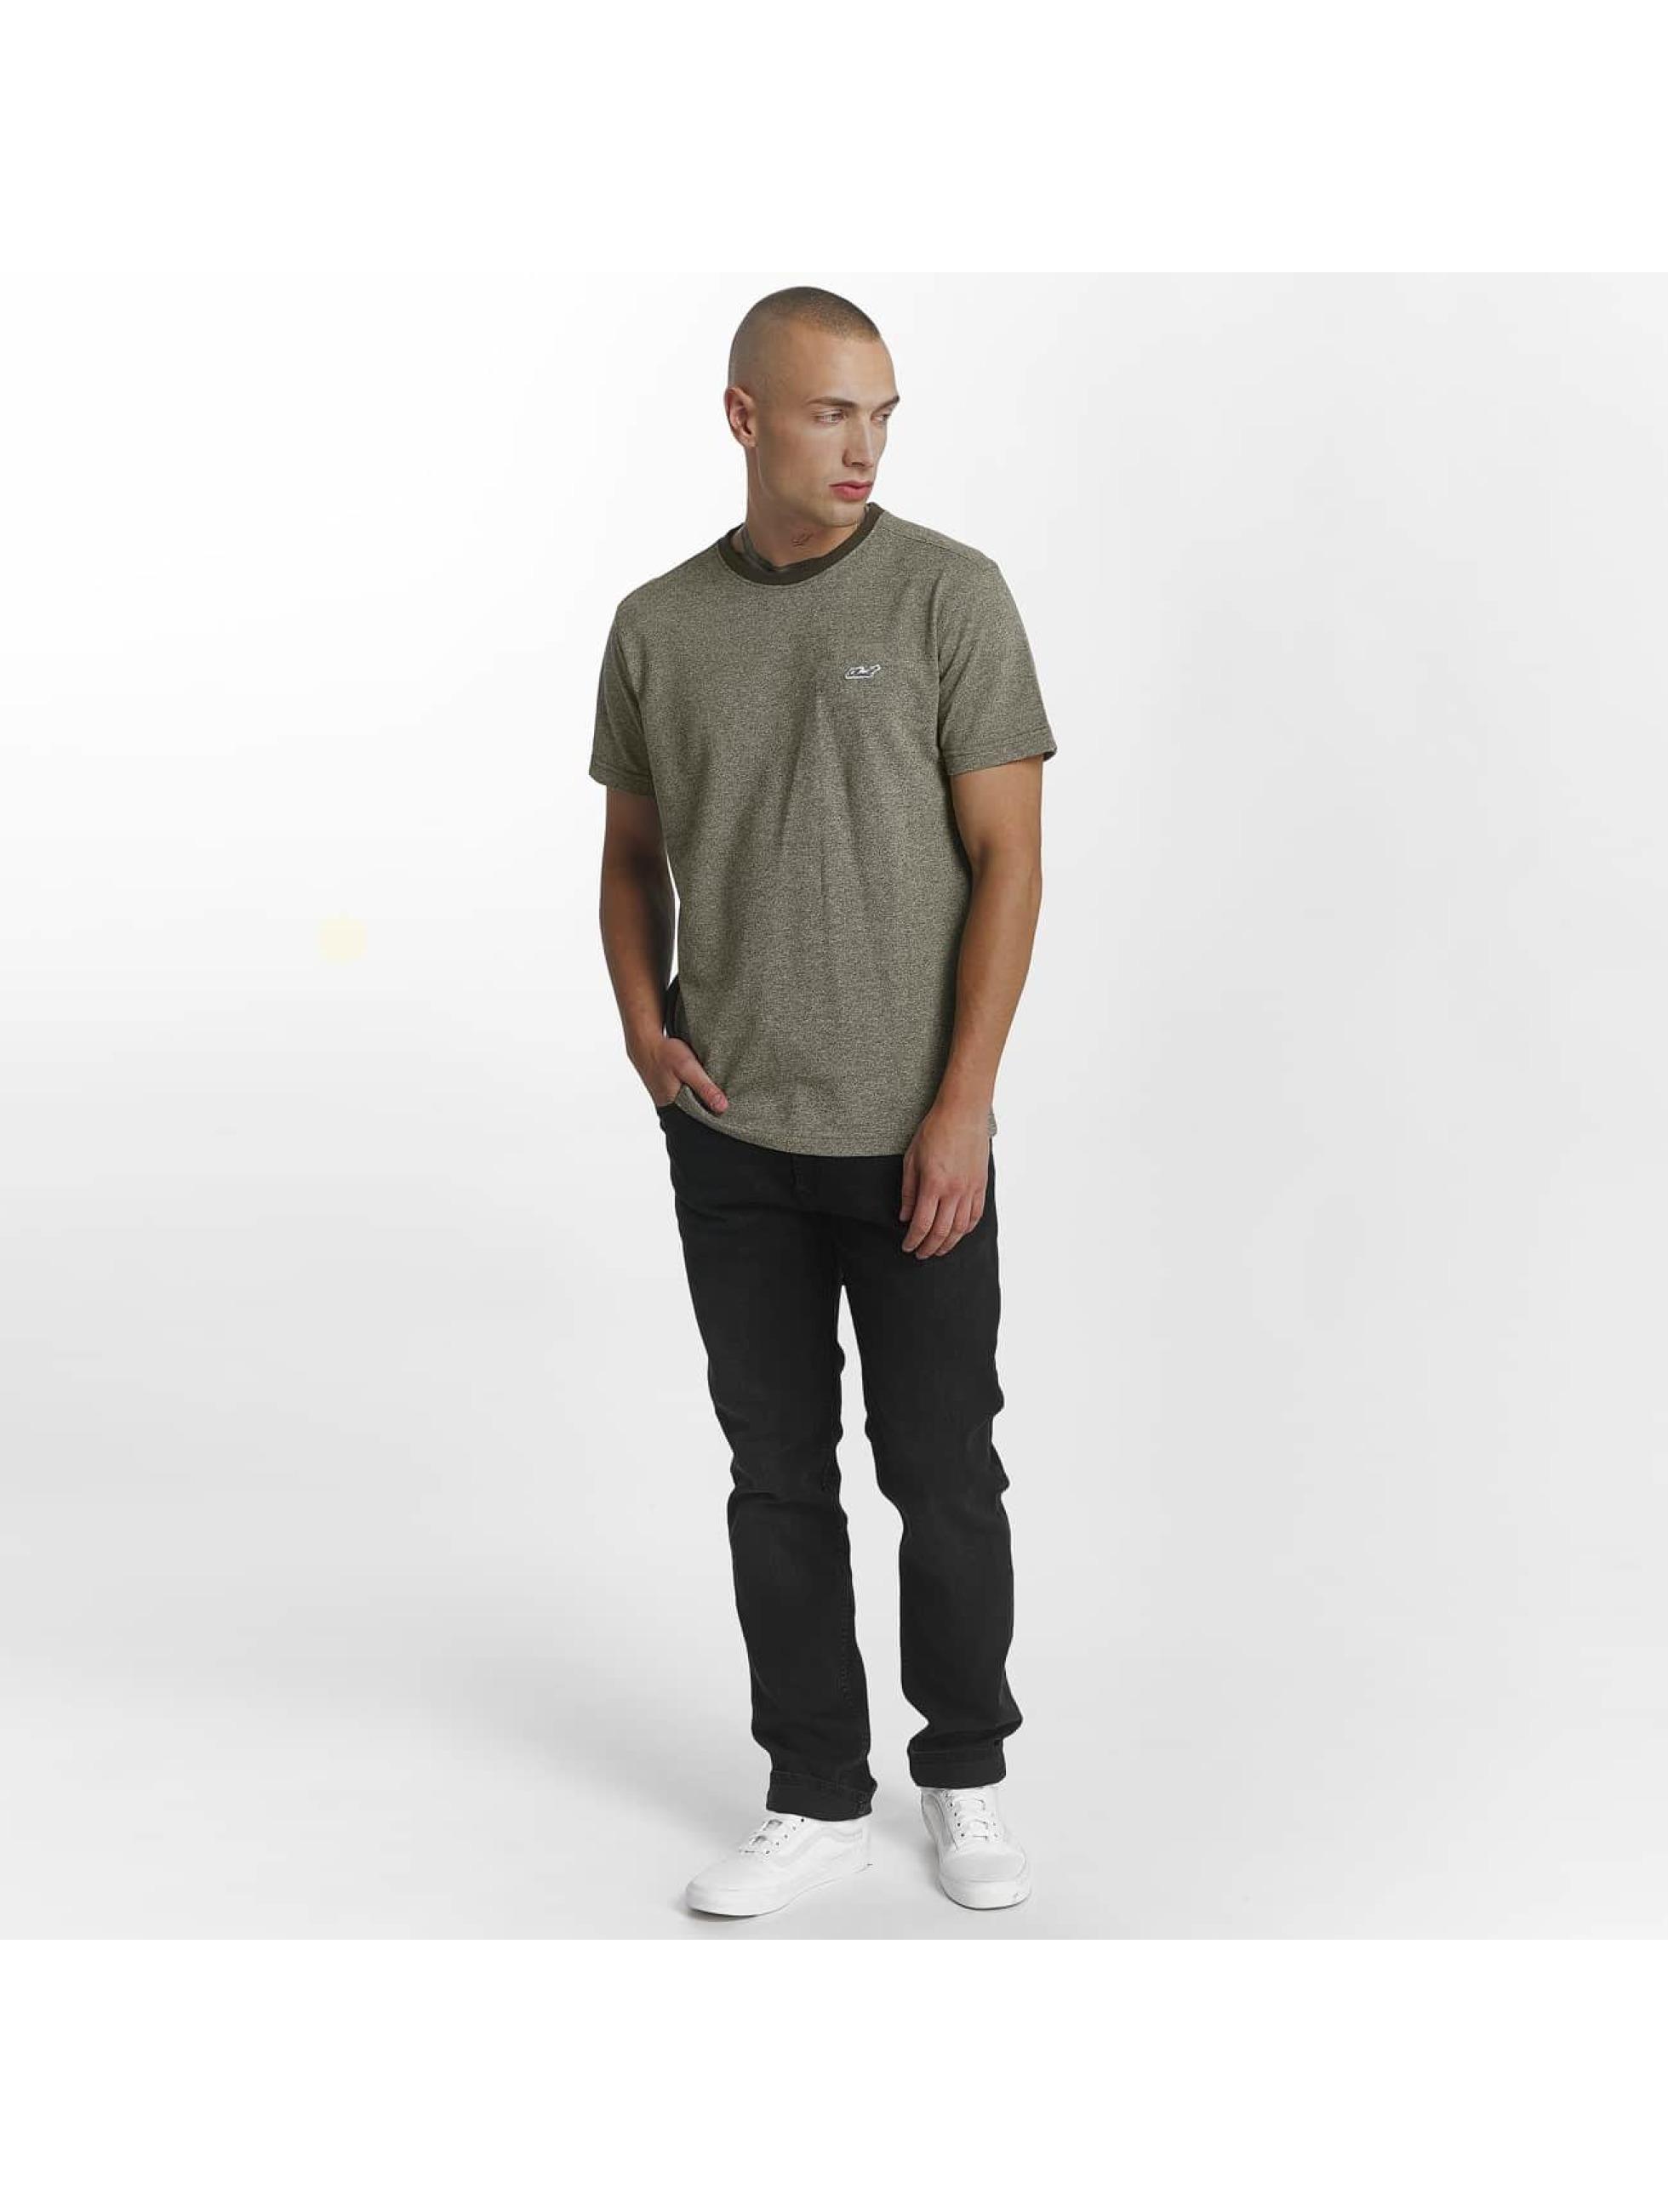 Reell Jeans Camiseta Pique oliva